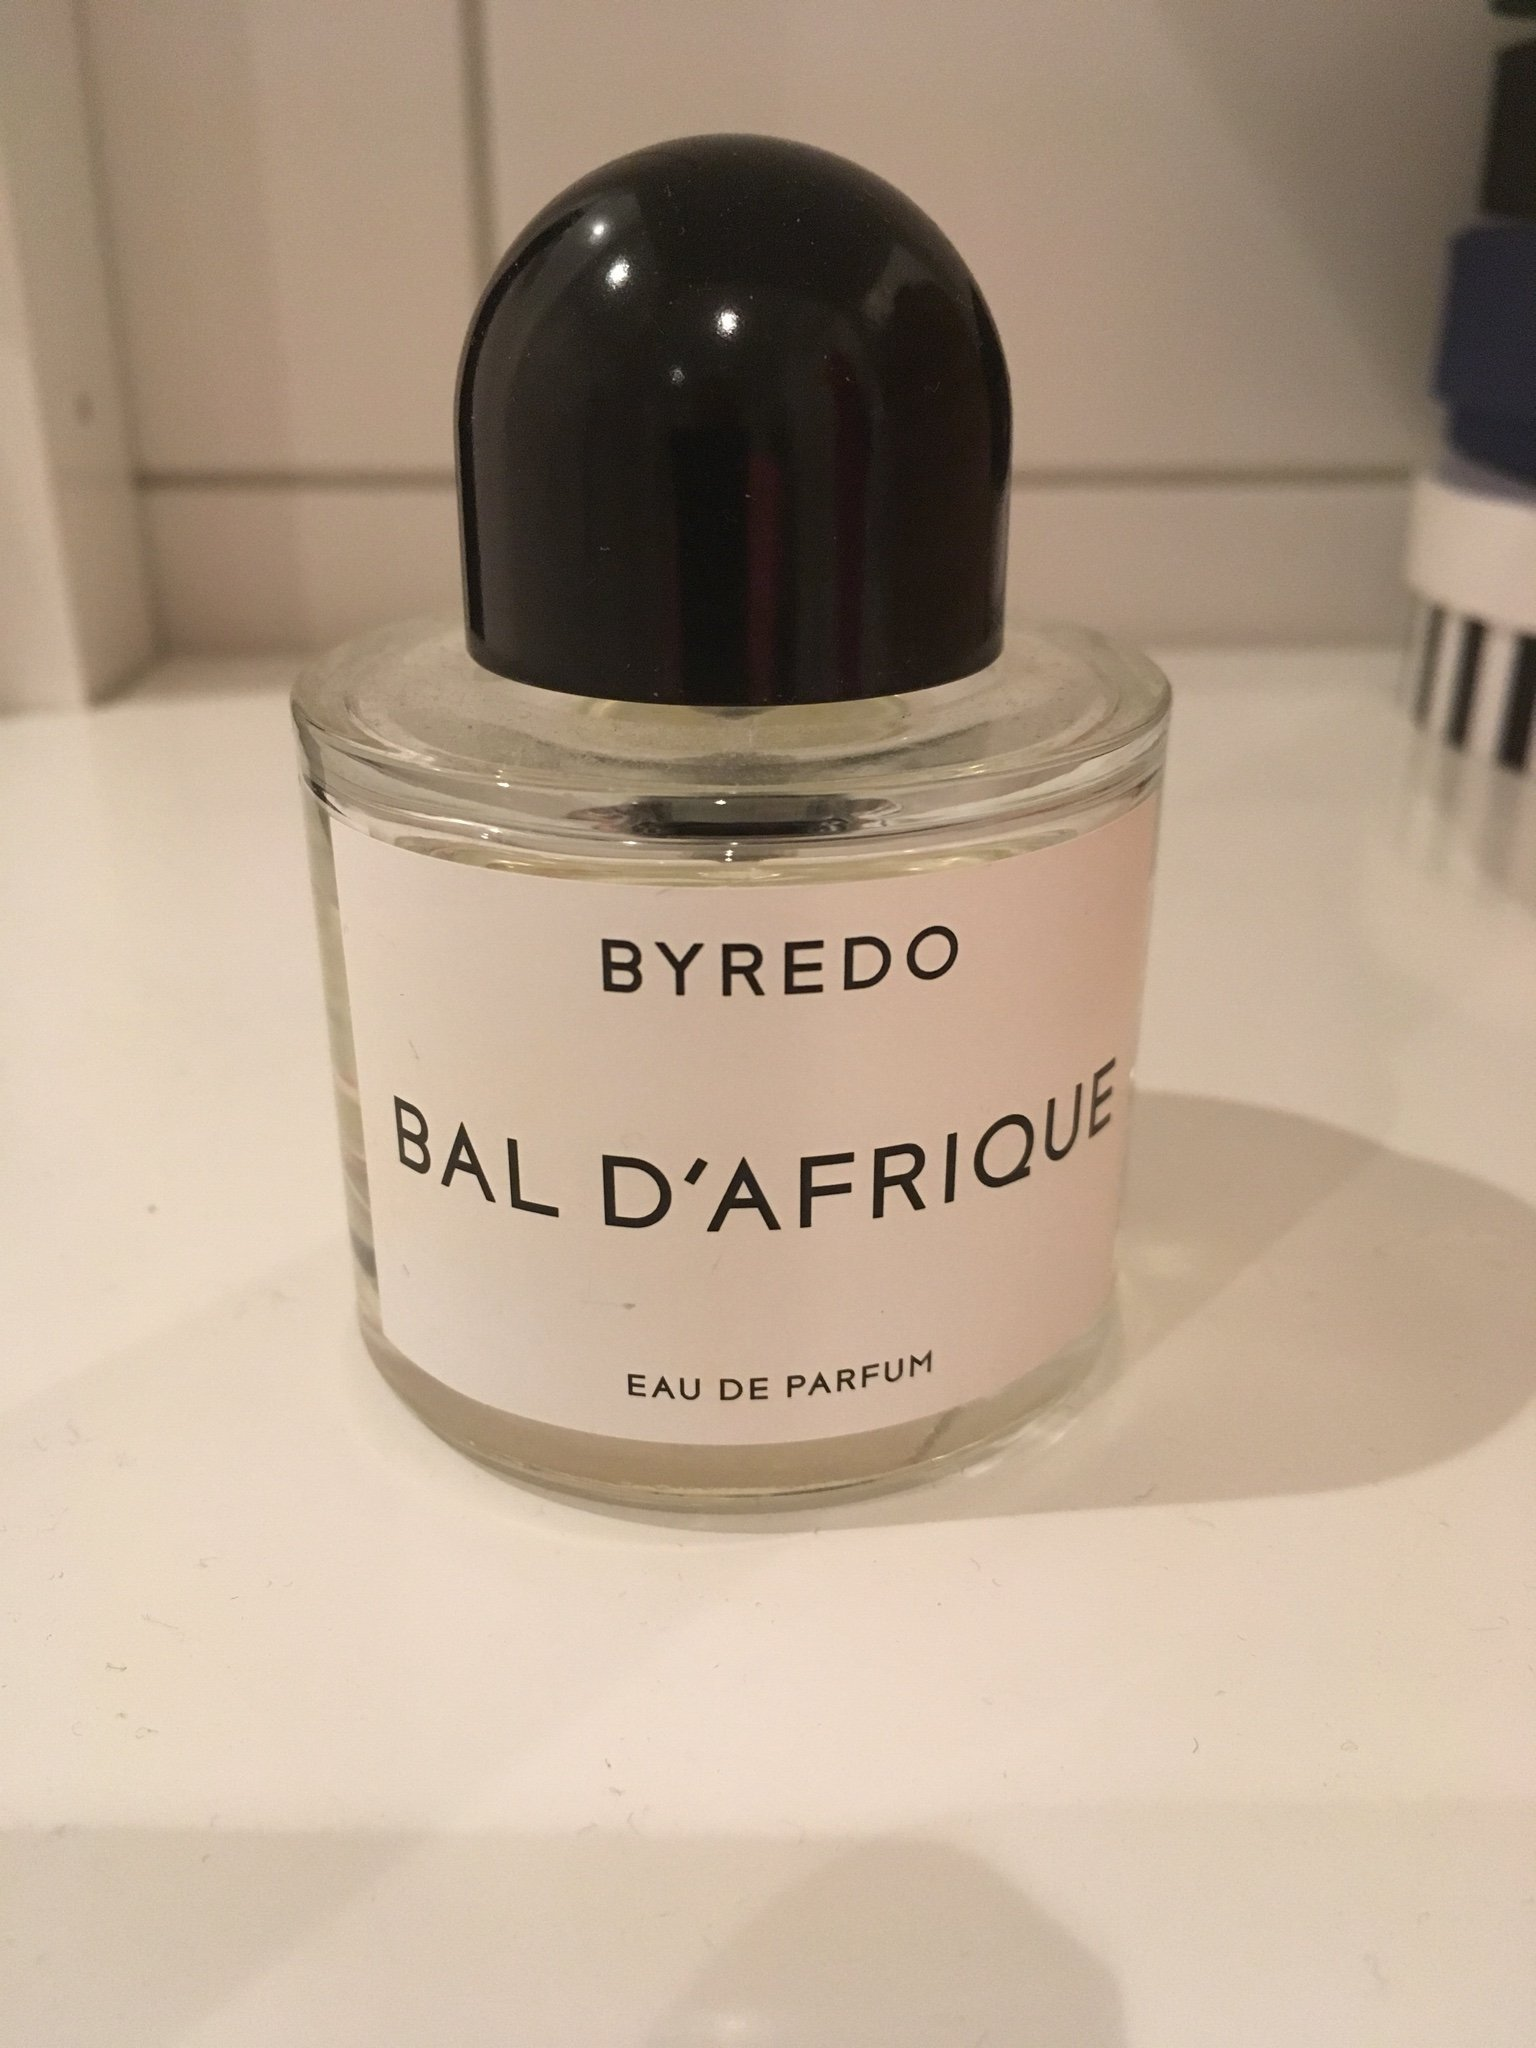 köpa byredo parfym